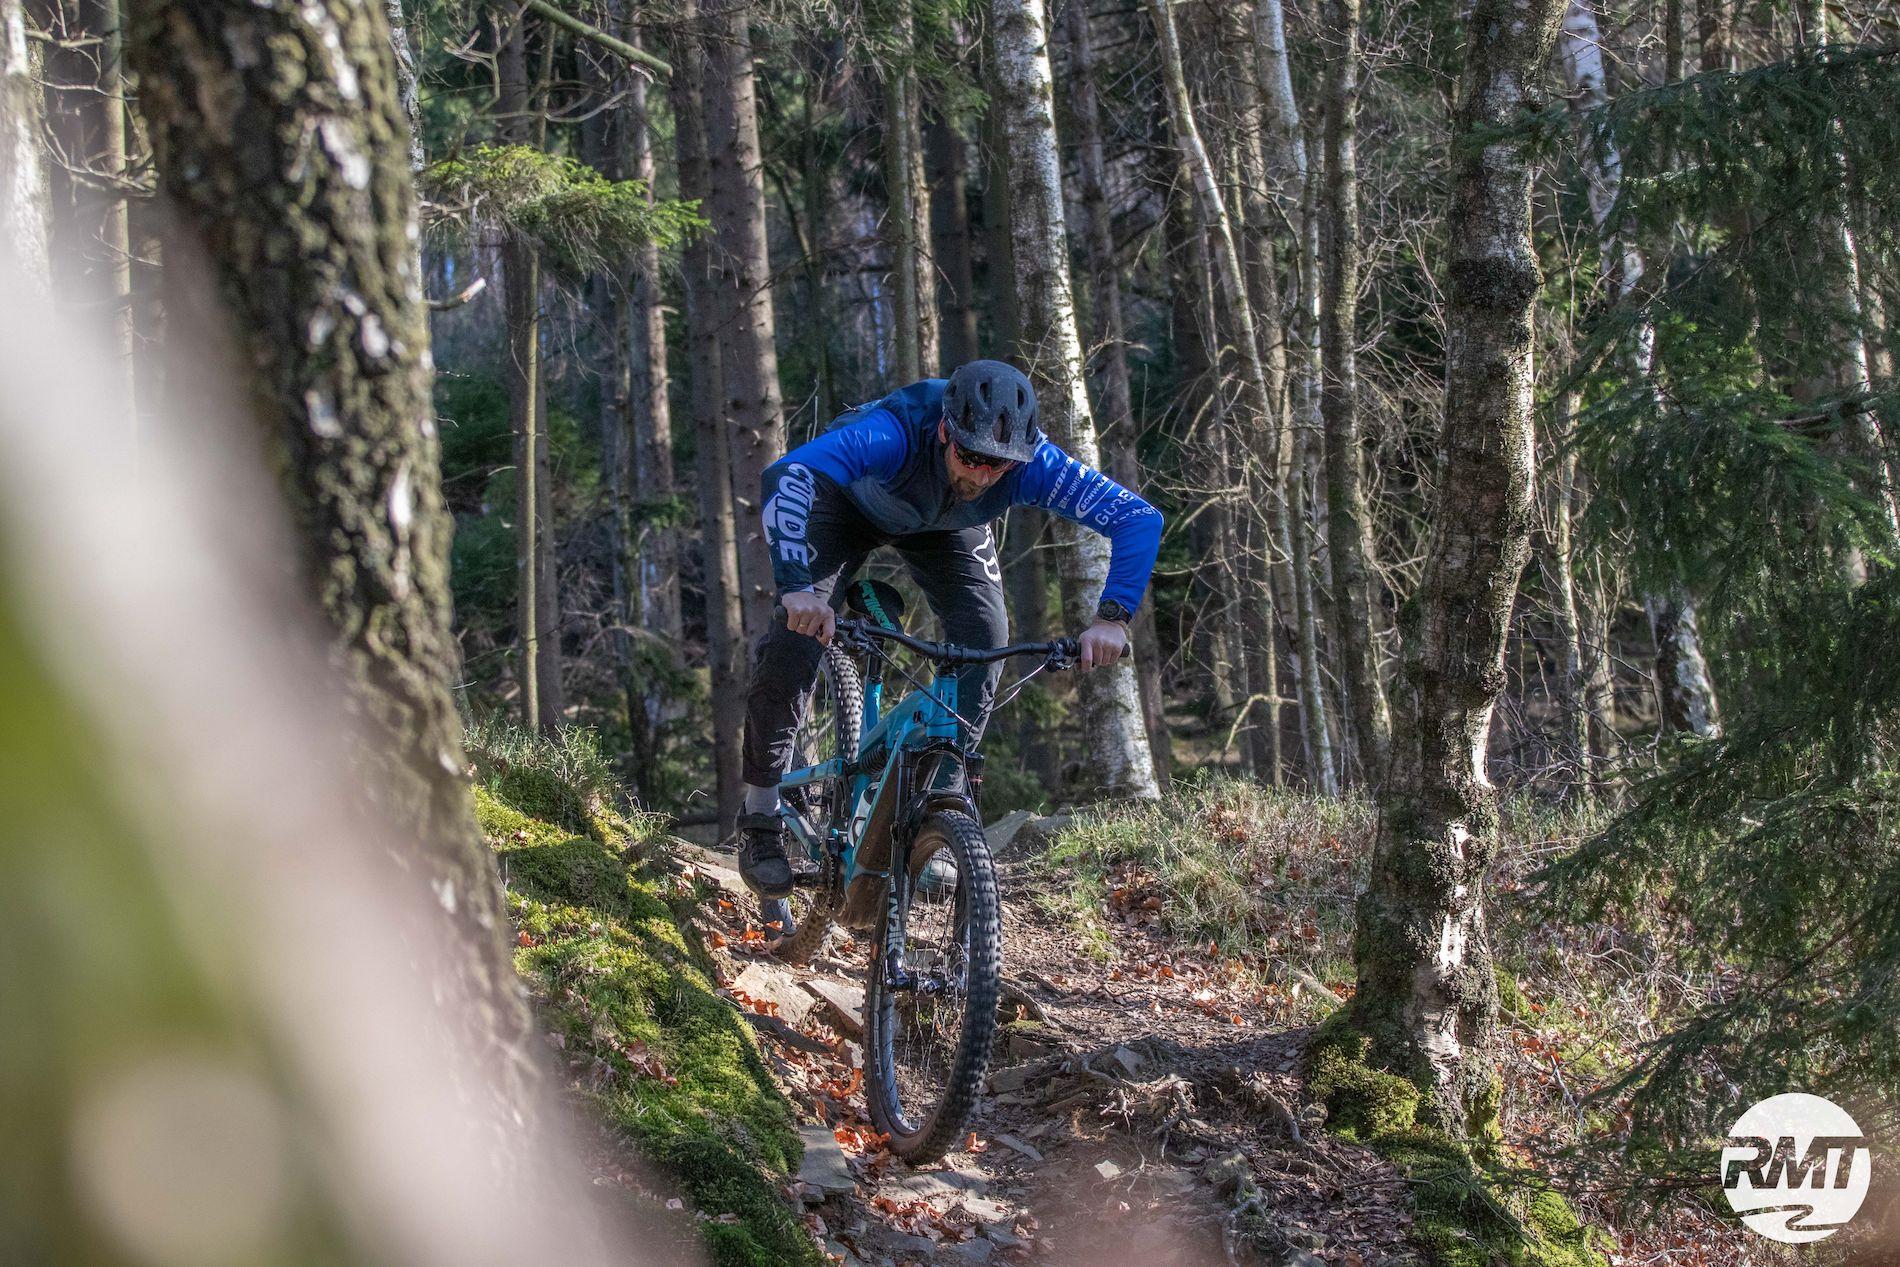 Enduro Fahrtechnik Kurs in Nürnberg - Bike Profi Training - Rock my Trail Bikeschule -1